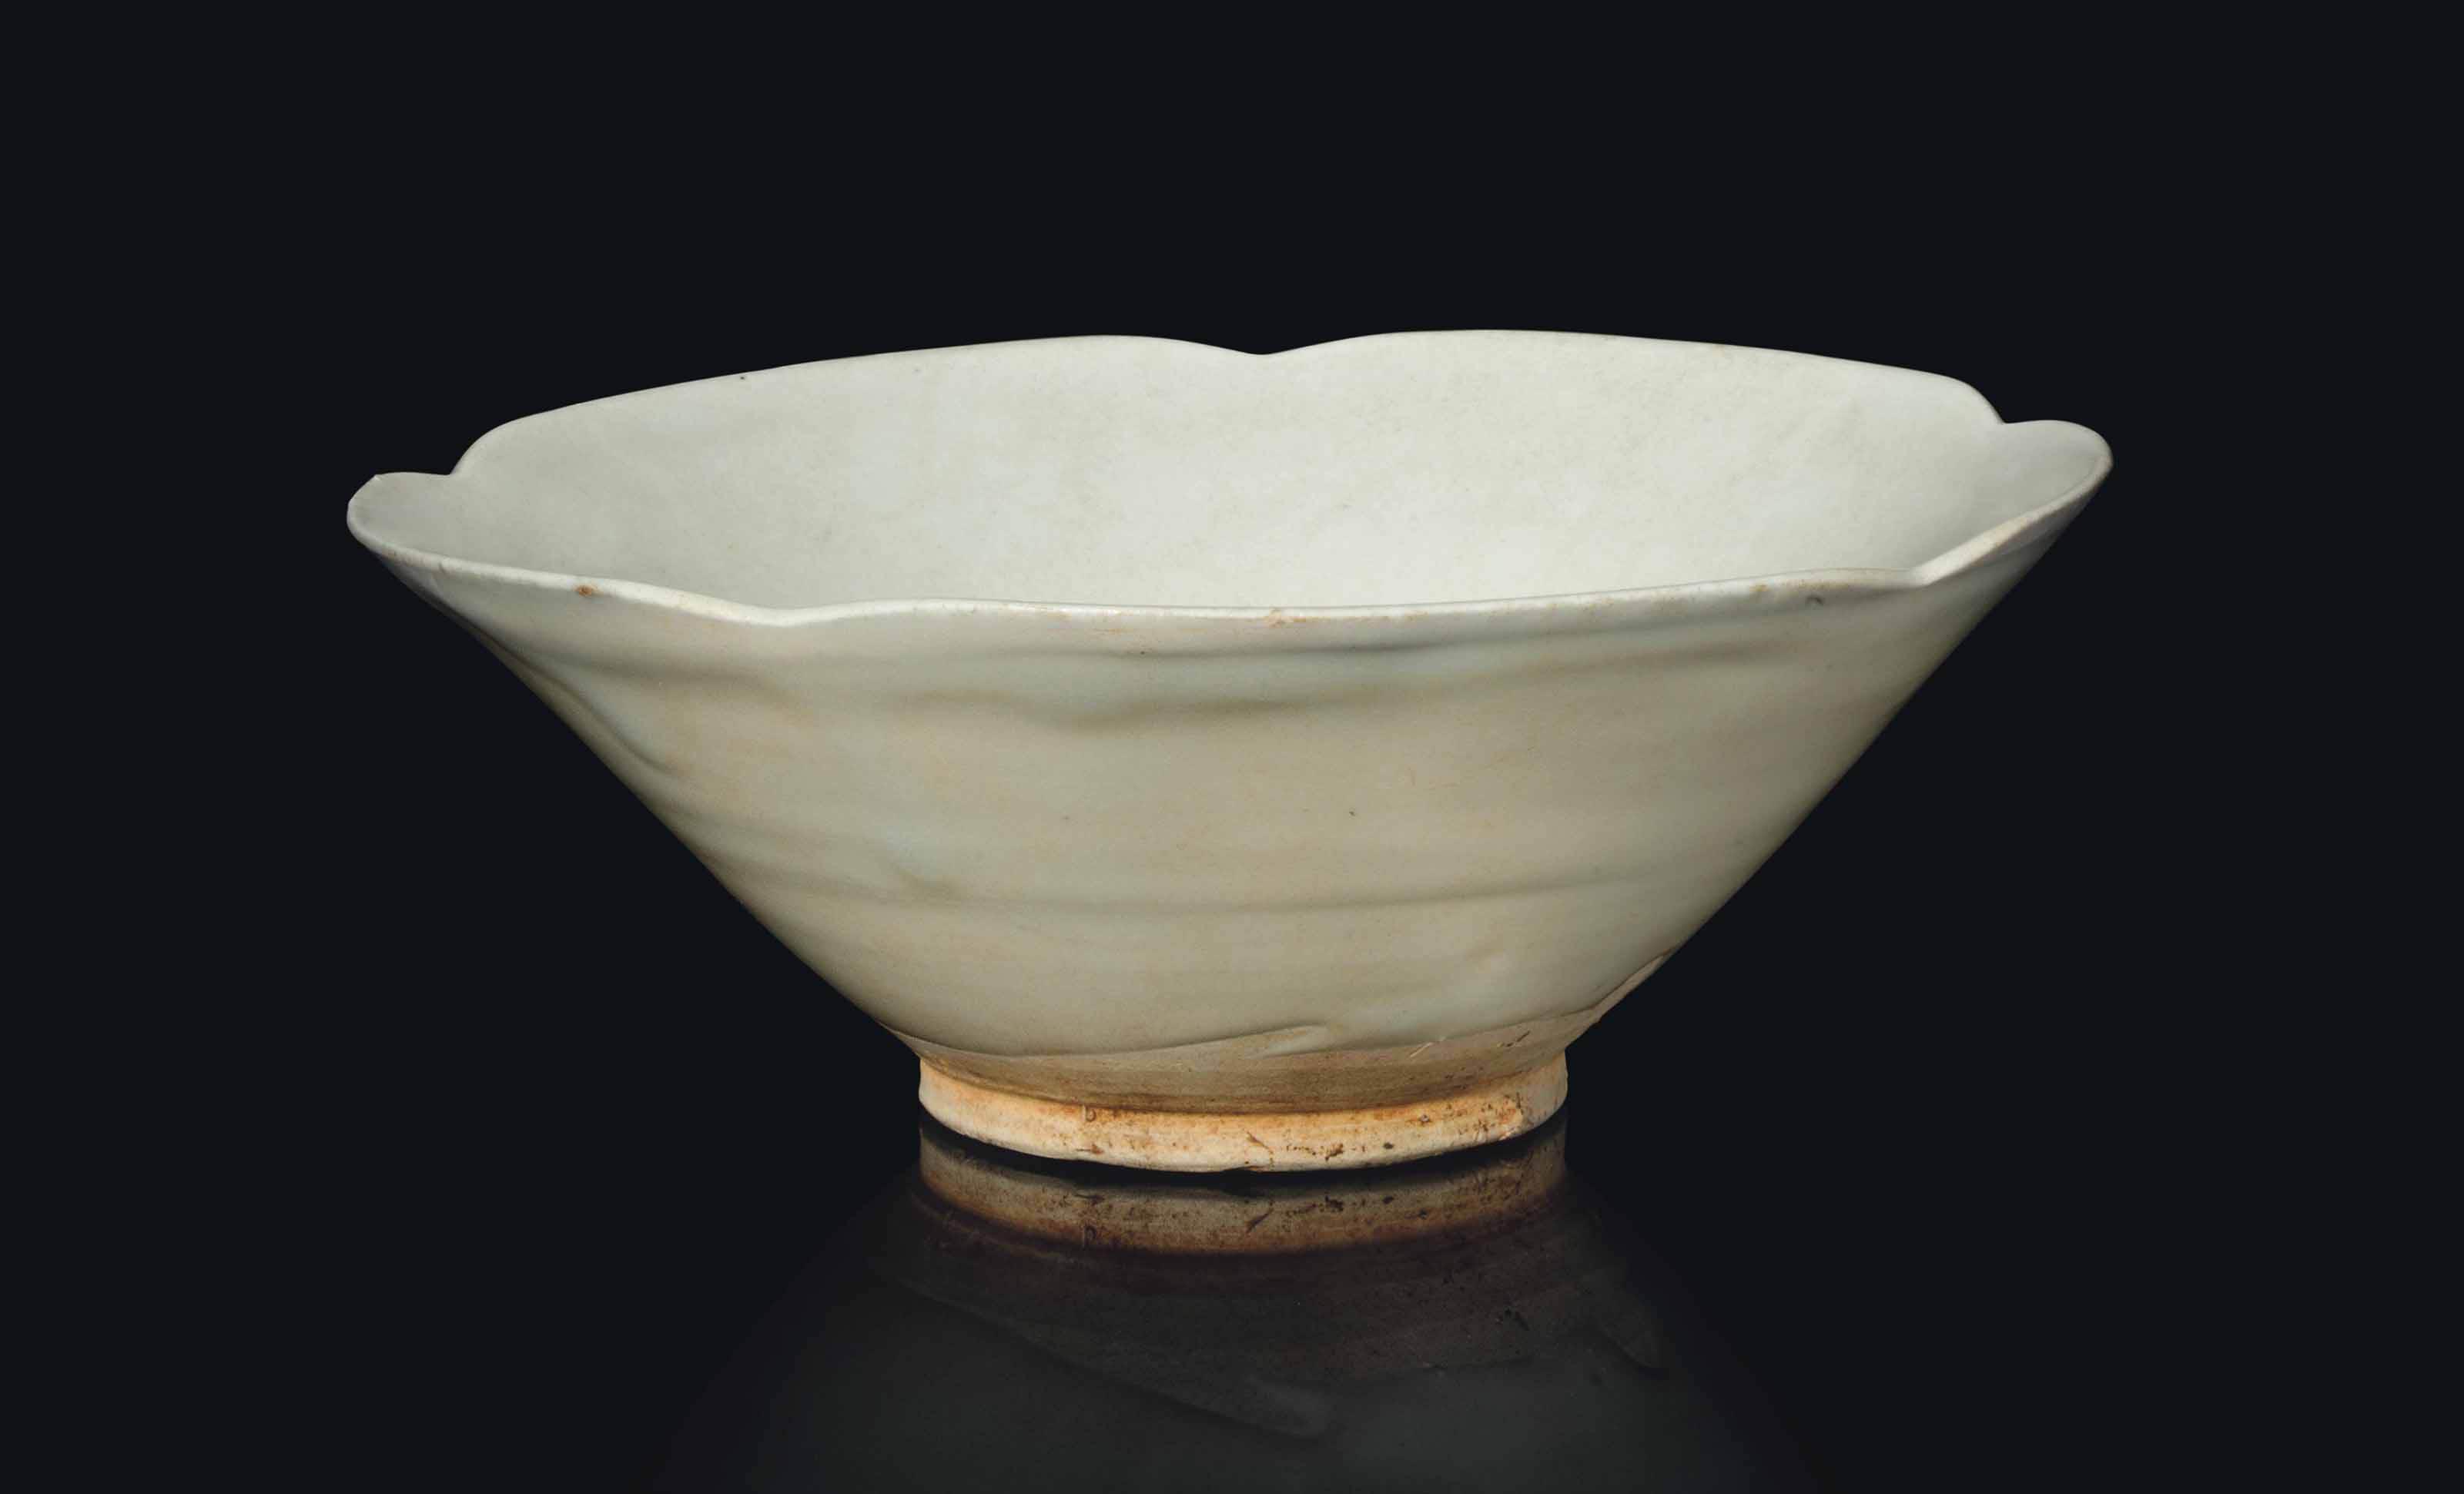 A CHINESE WHITE-GLAZED BOWL